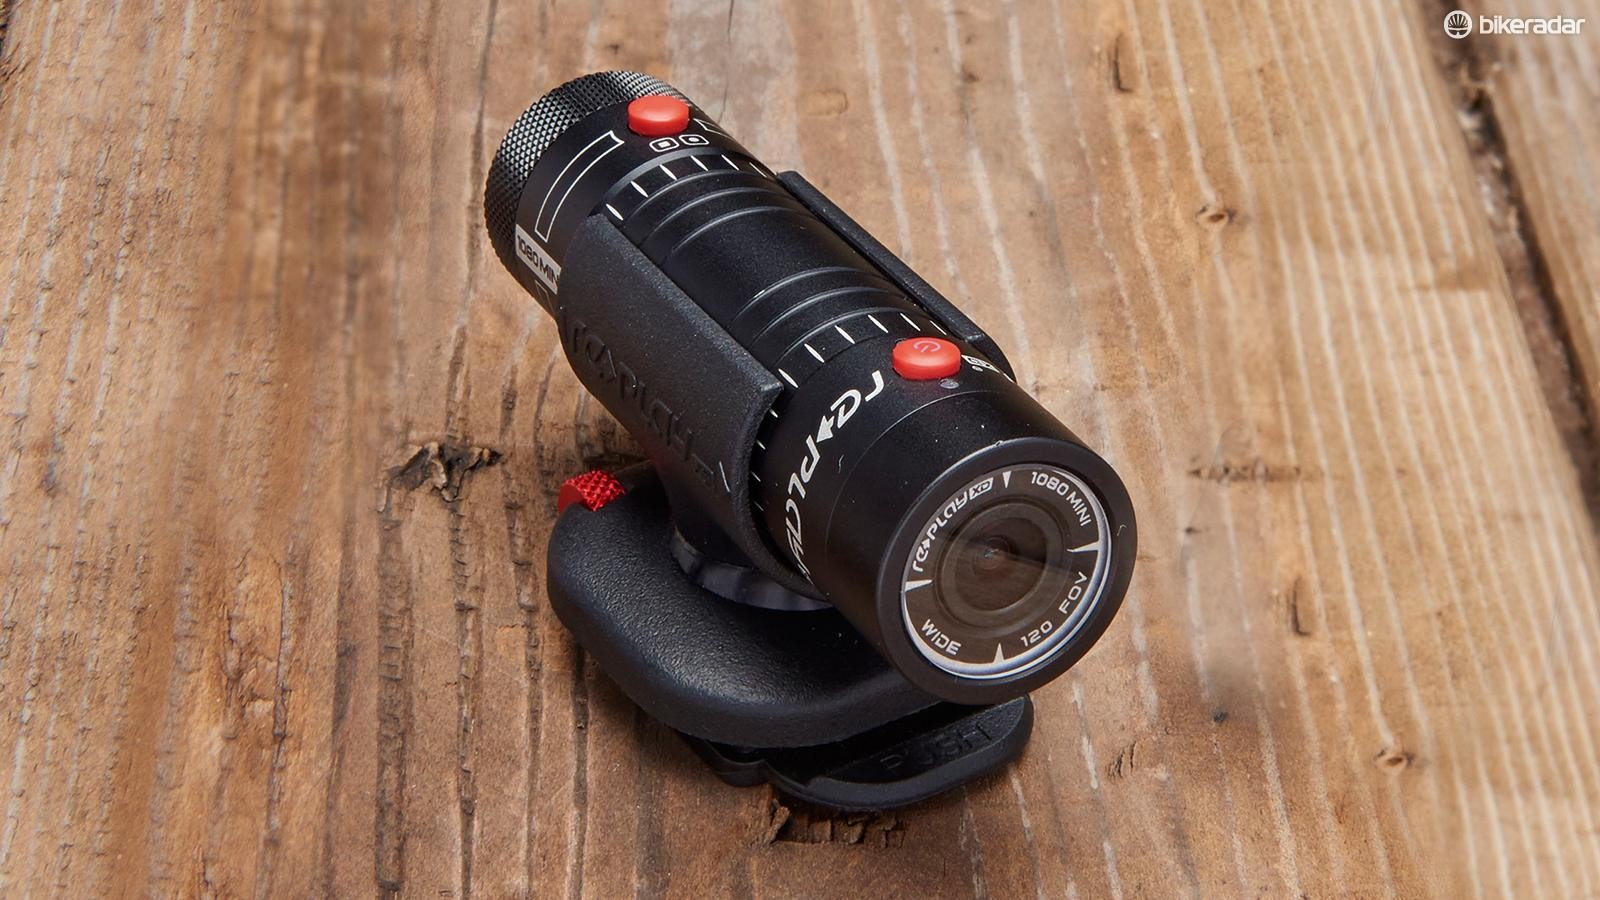 Replay XD 1080 Mini action camera